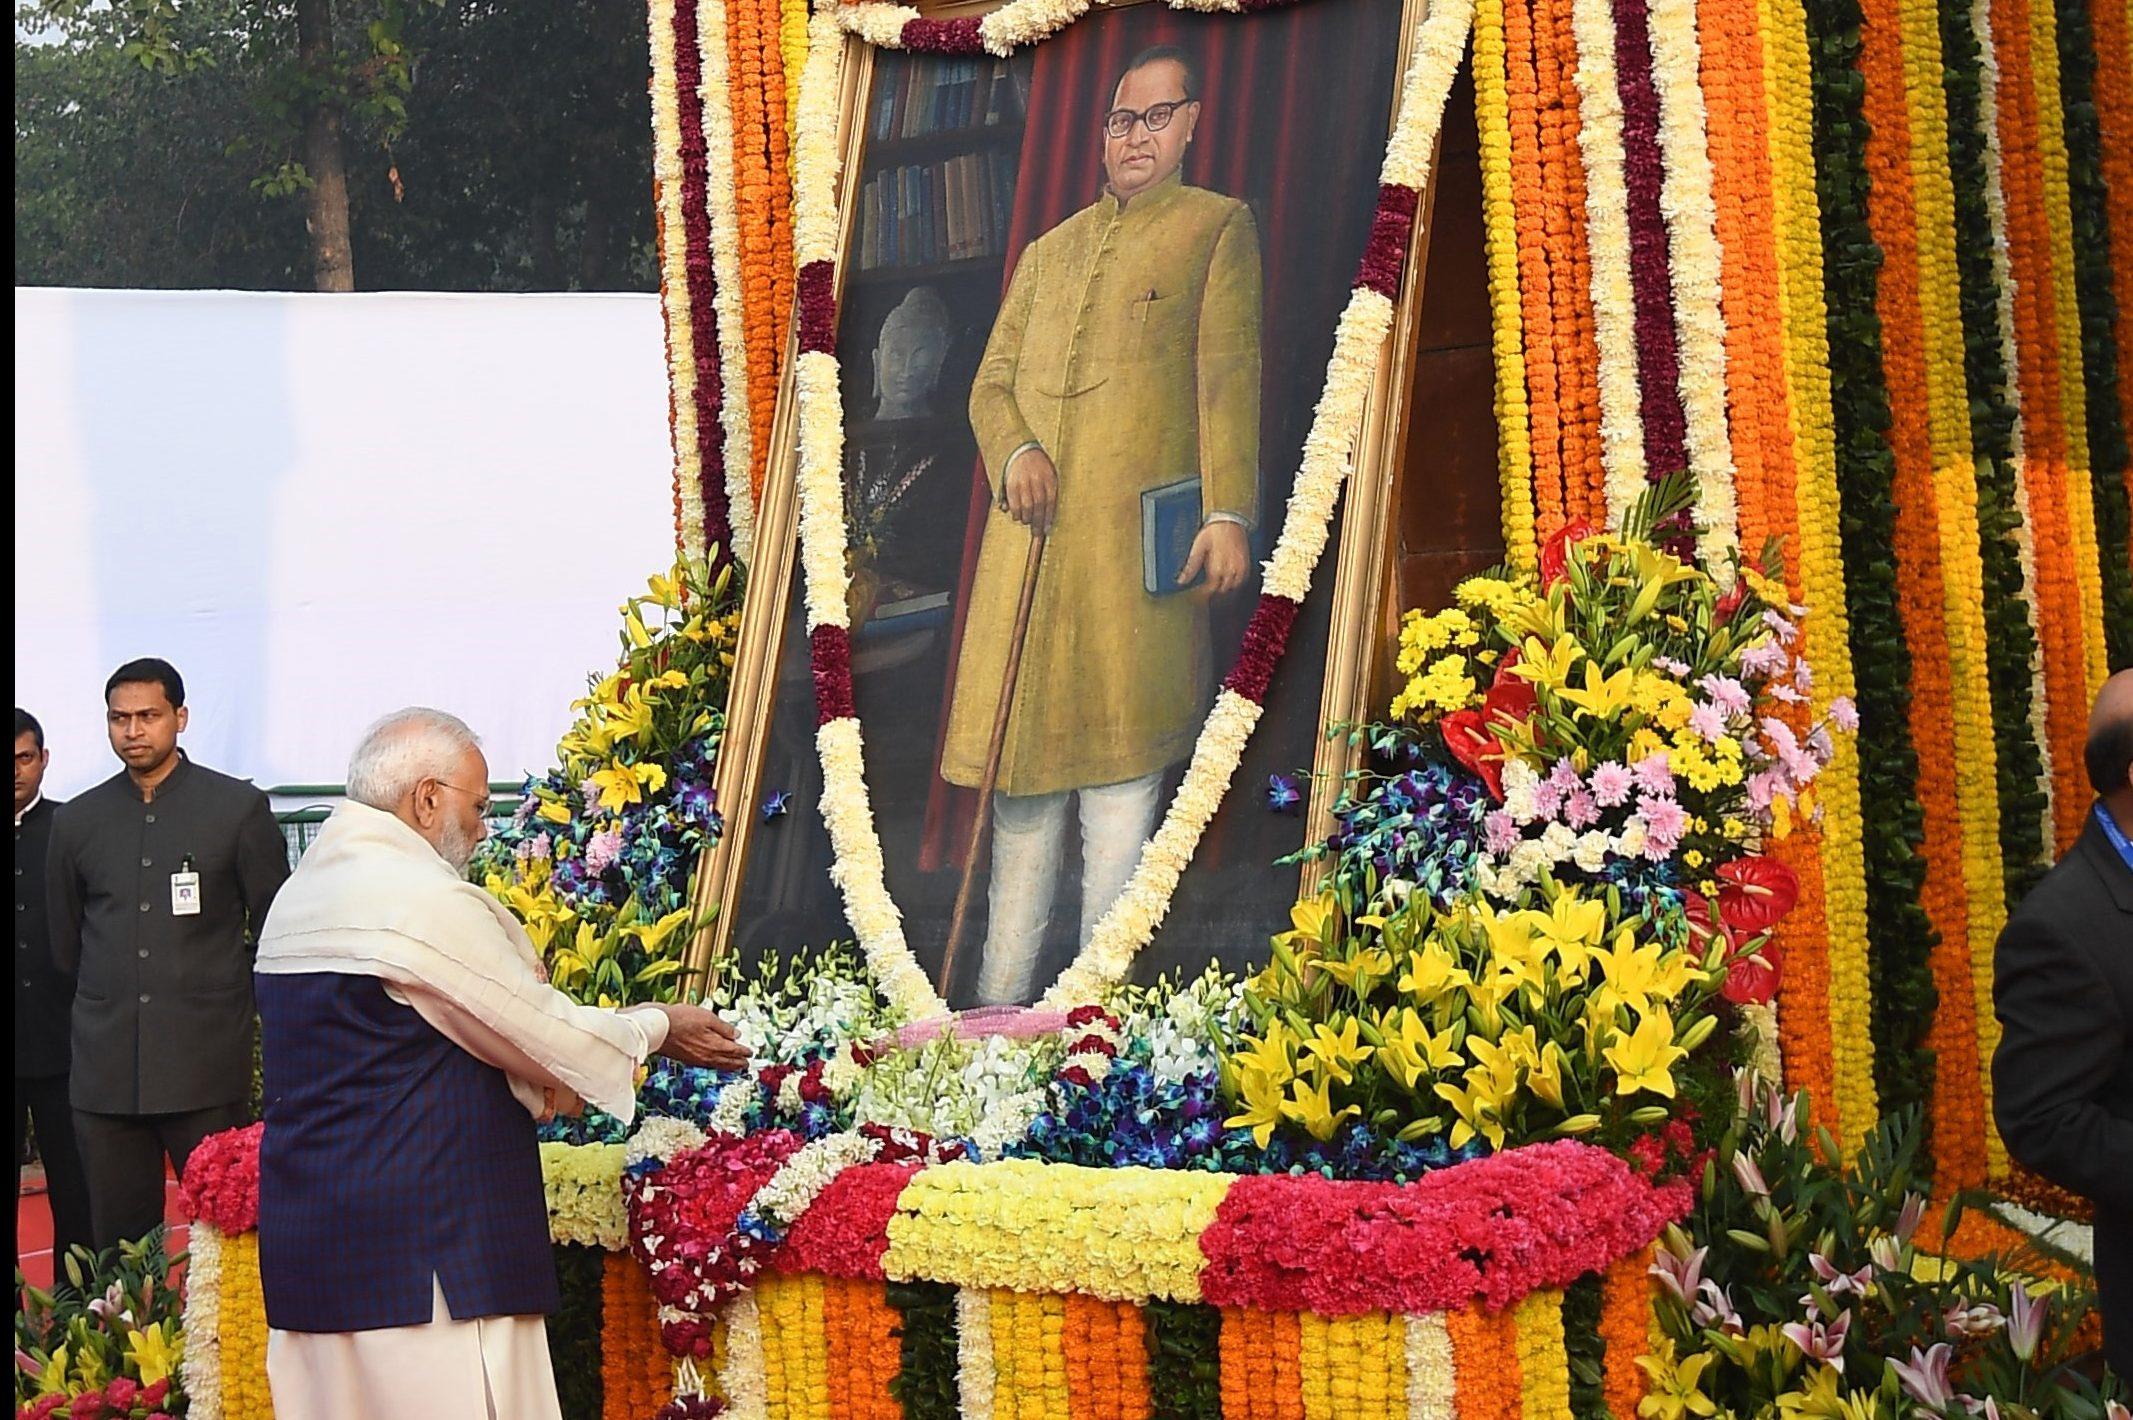 PM pays homage to Dr. Babasaheb Ambedkar on his Mahaparinirvan Diwas